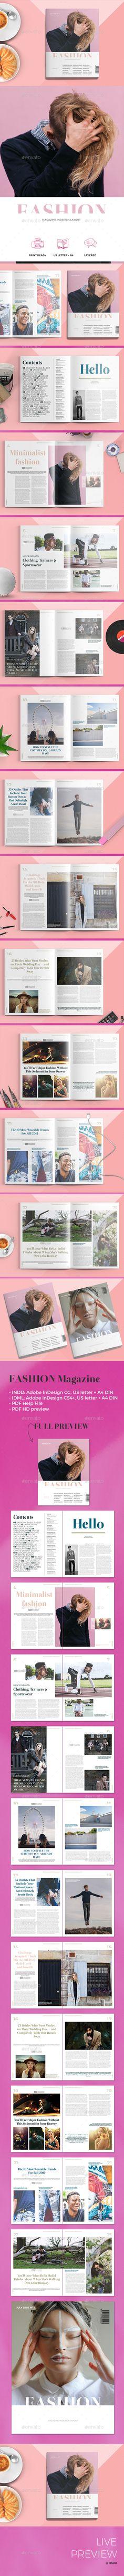 4 in 1 Magazines Templates InDesign INDD Bundle #design Download ...